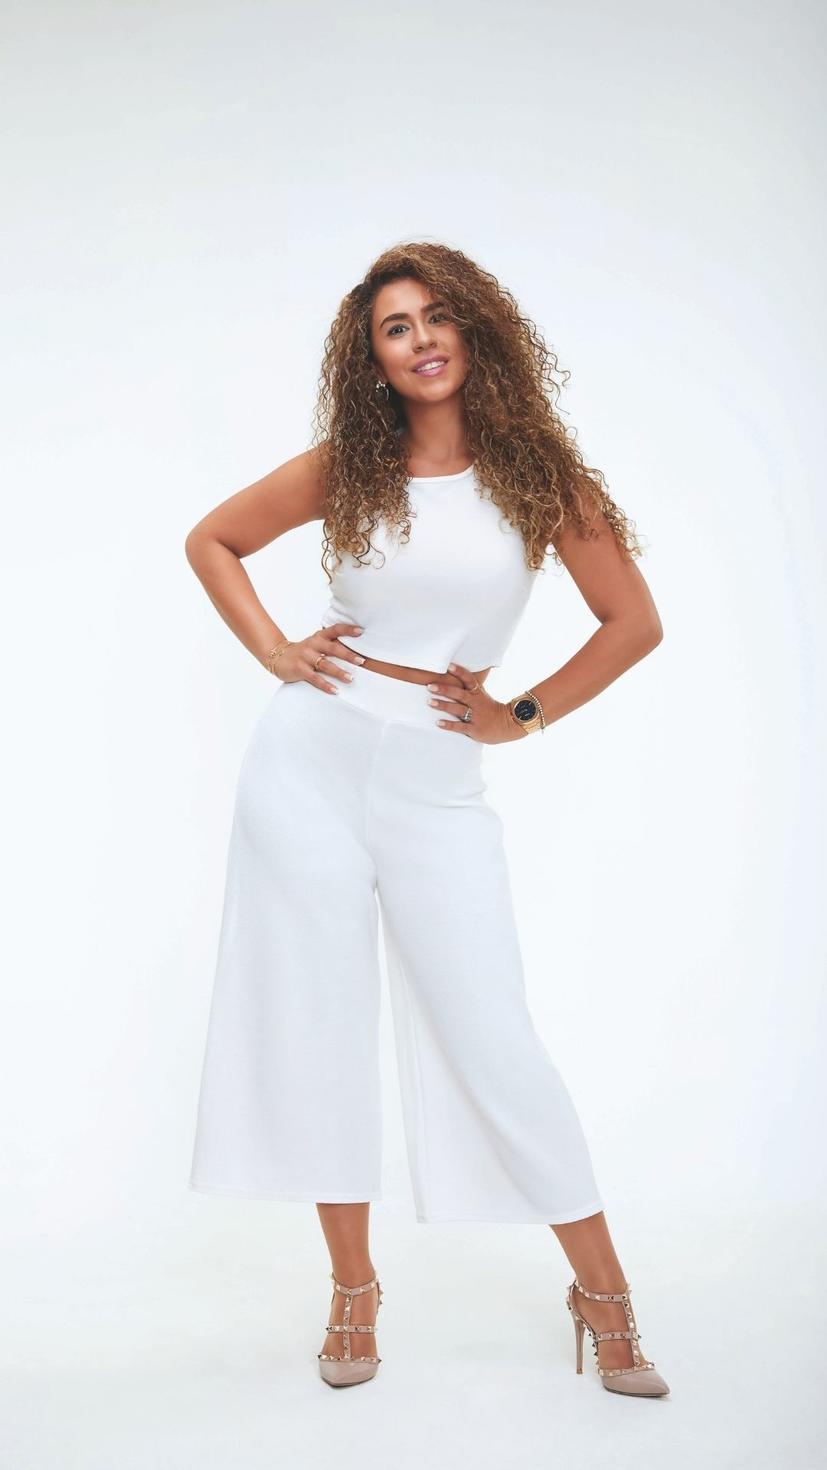 AYA, IAMAYA, Arab women, Youtube, Instagram, Arabic fashion series